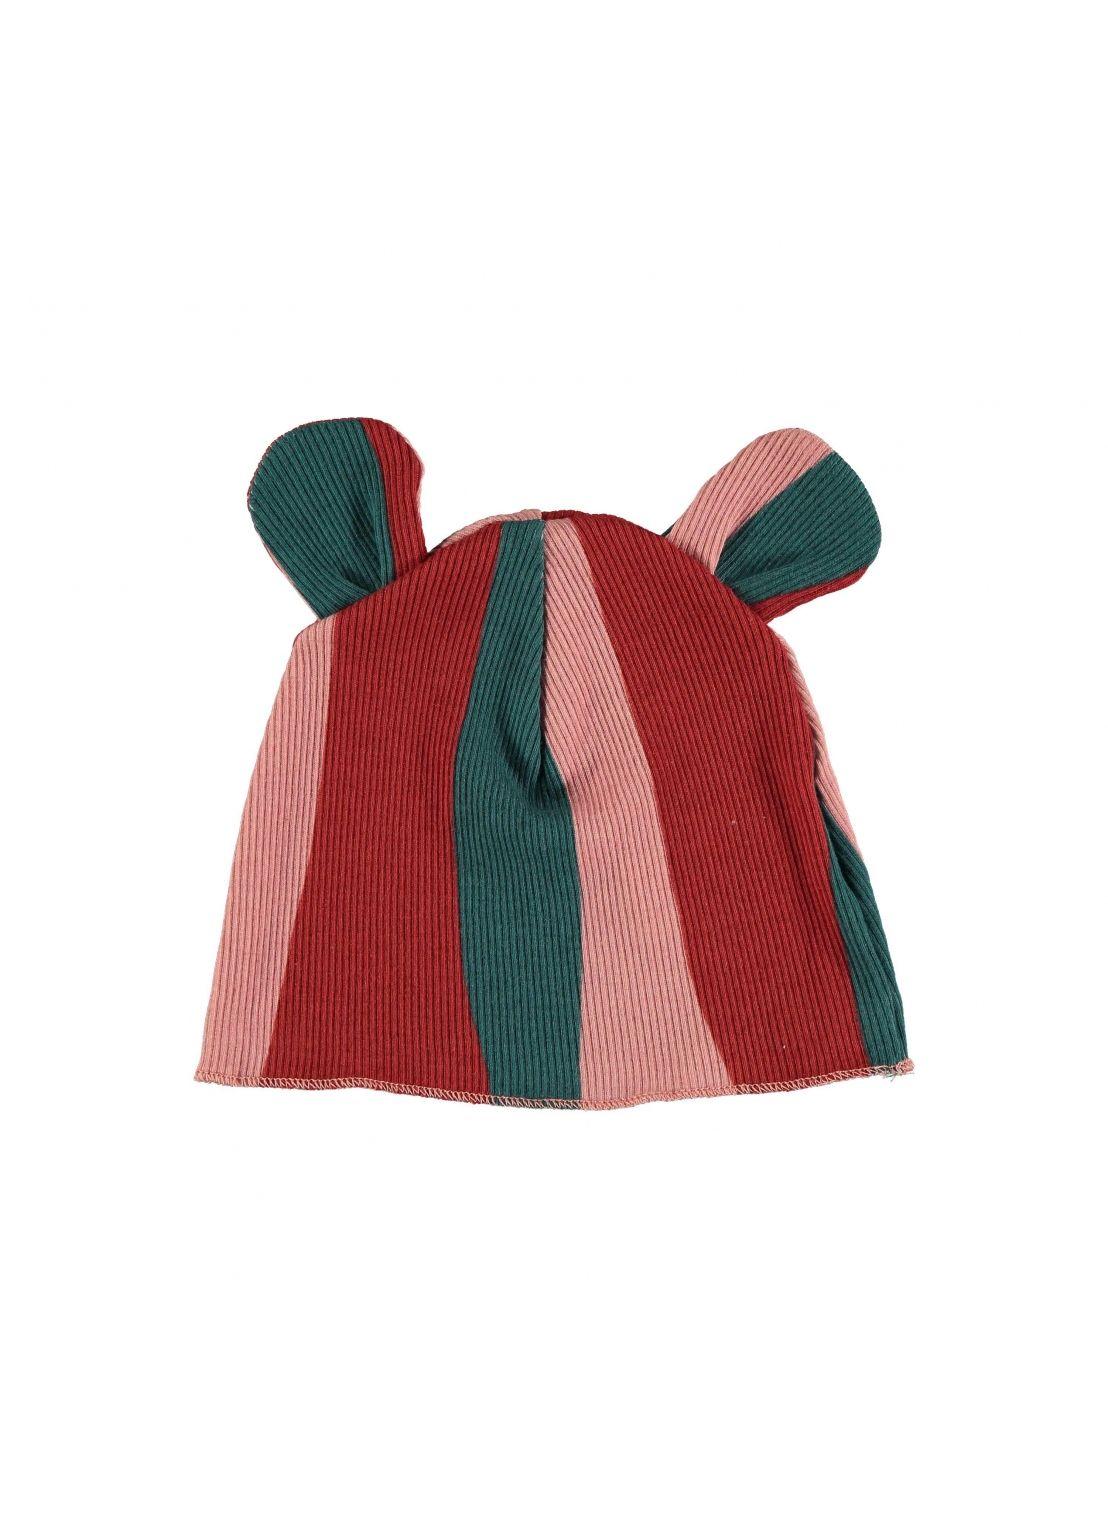 Baby CAP Unisex-98% Cotton 2% Elastan- Knitted